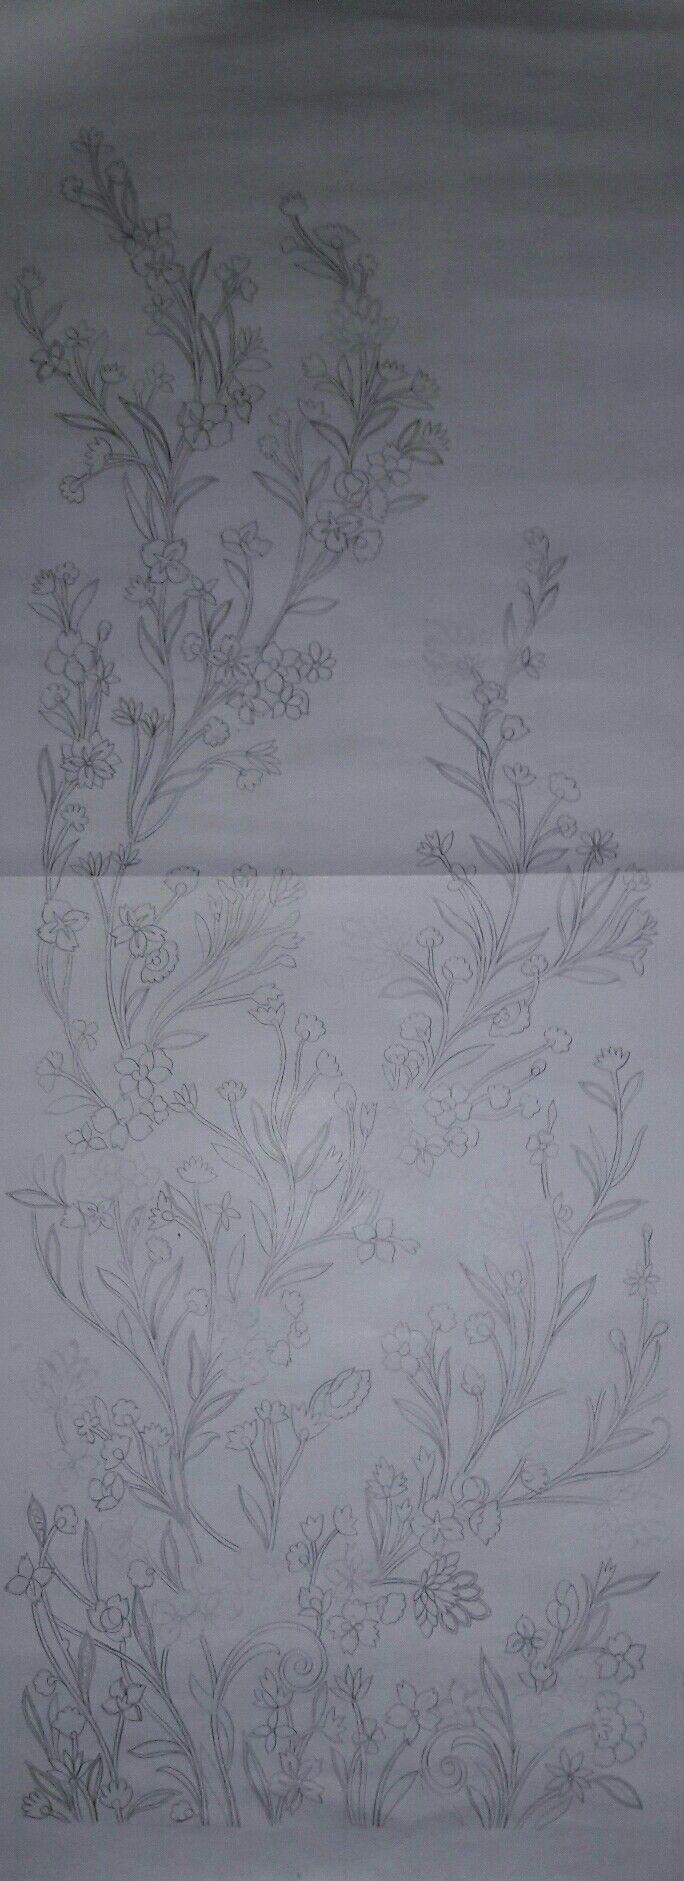 Pin by janaki bandari on embroidery patterns in pinterest